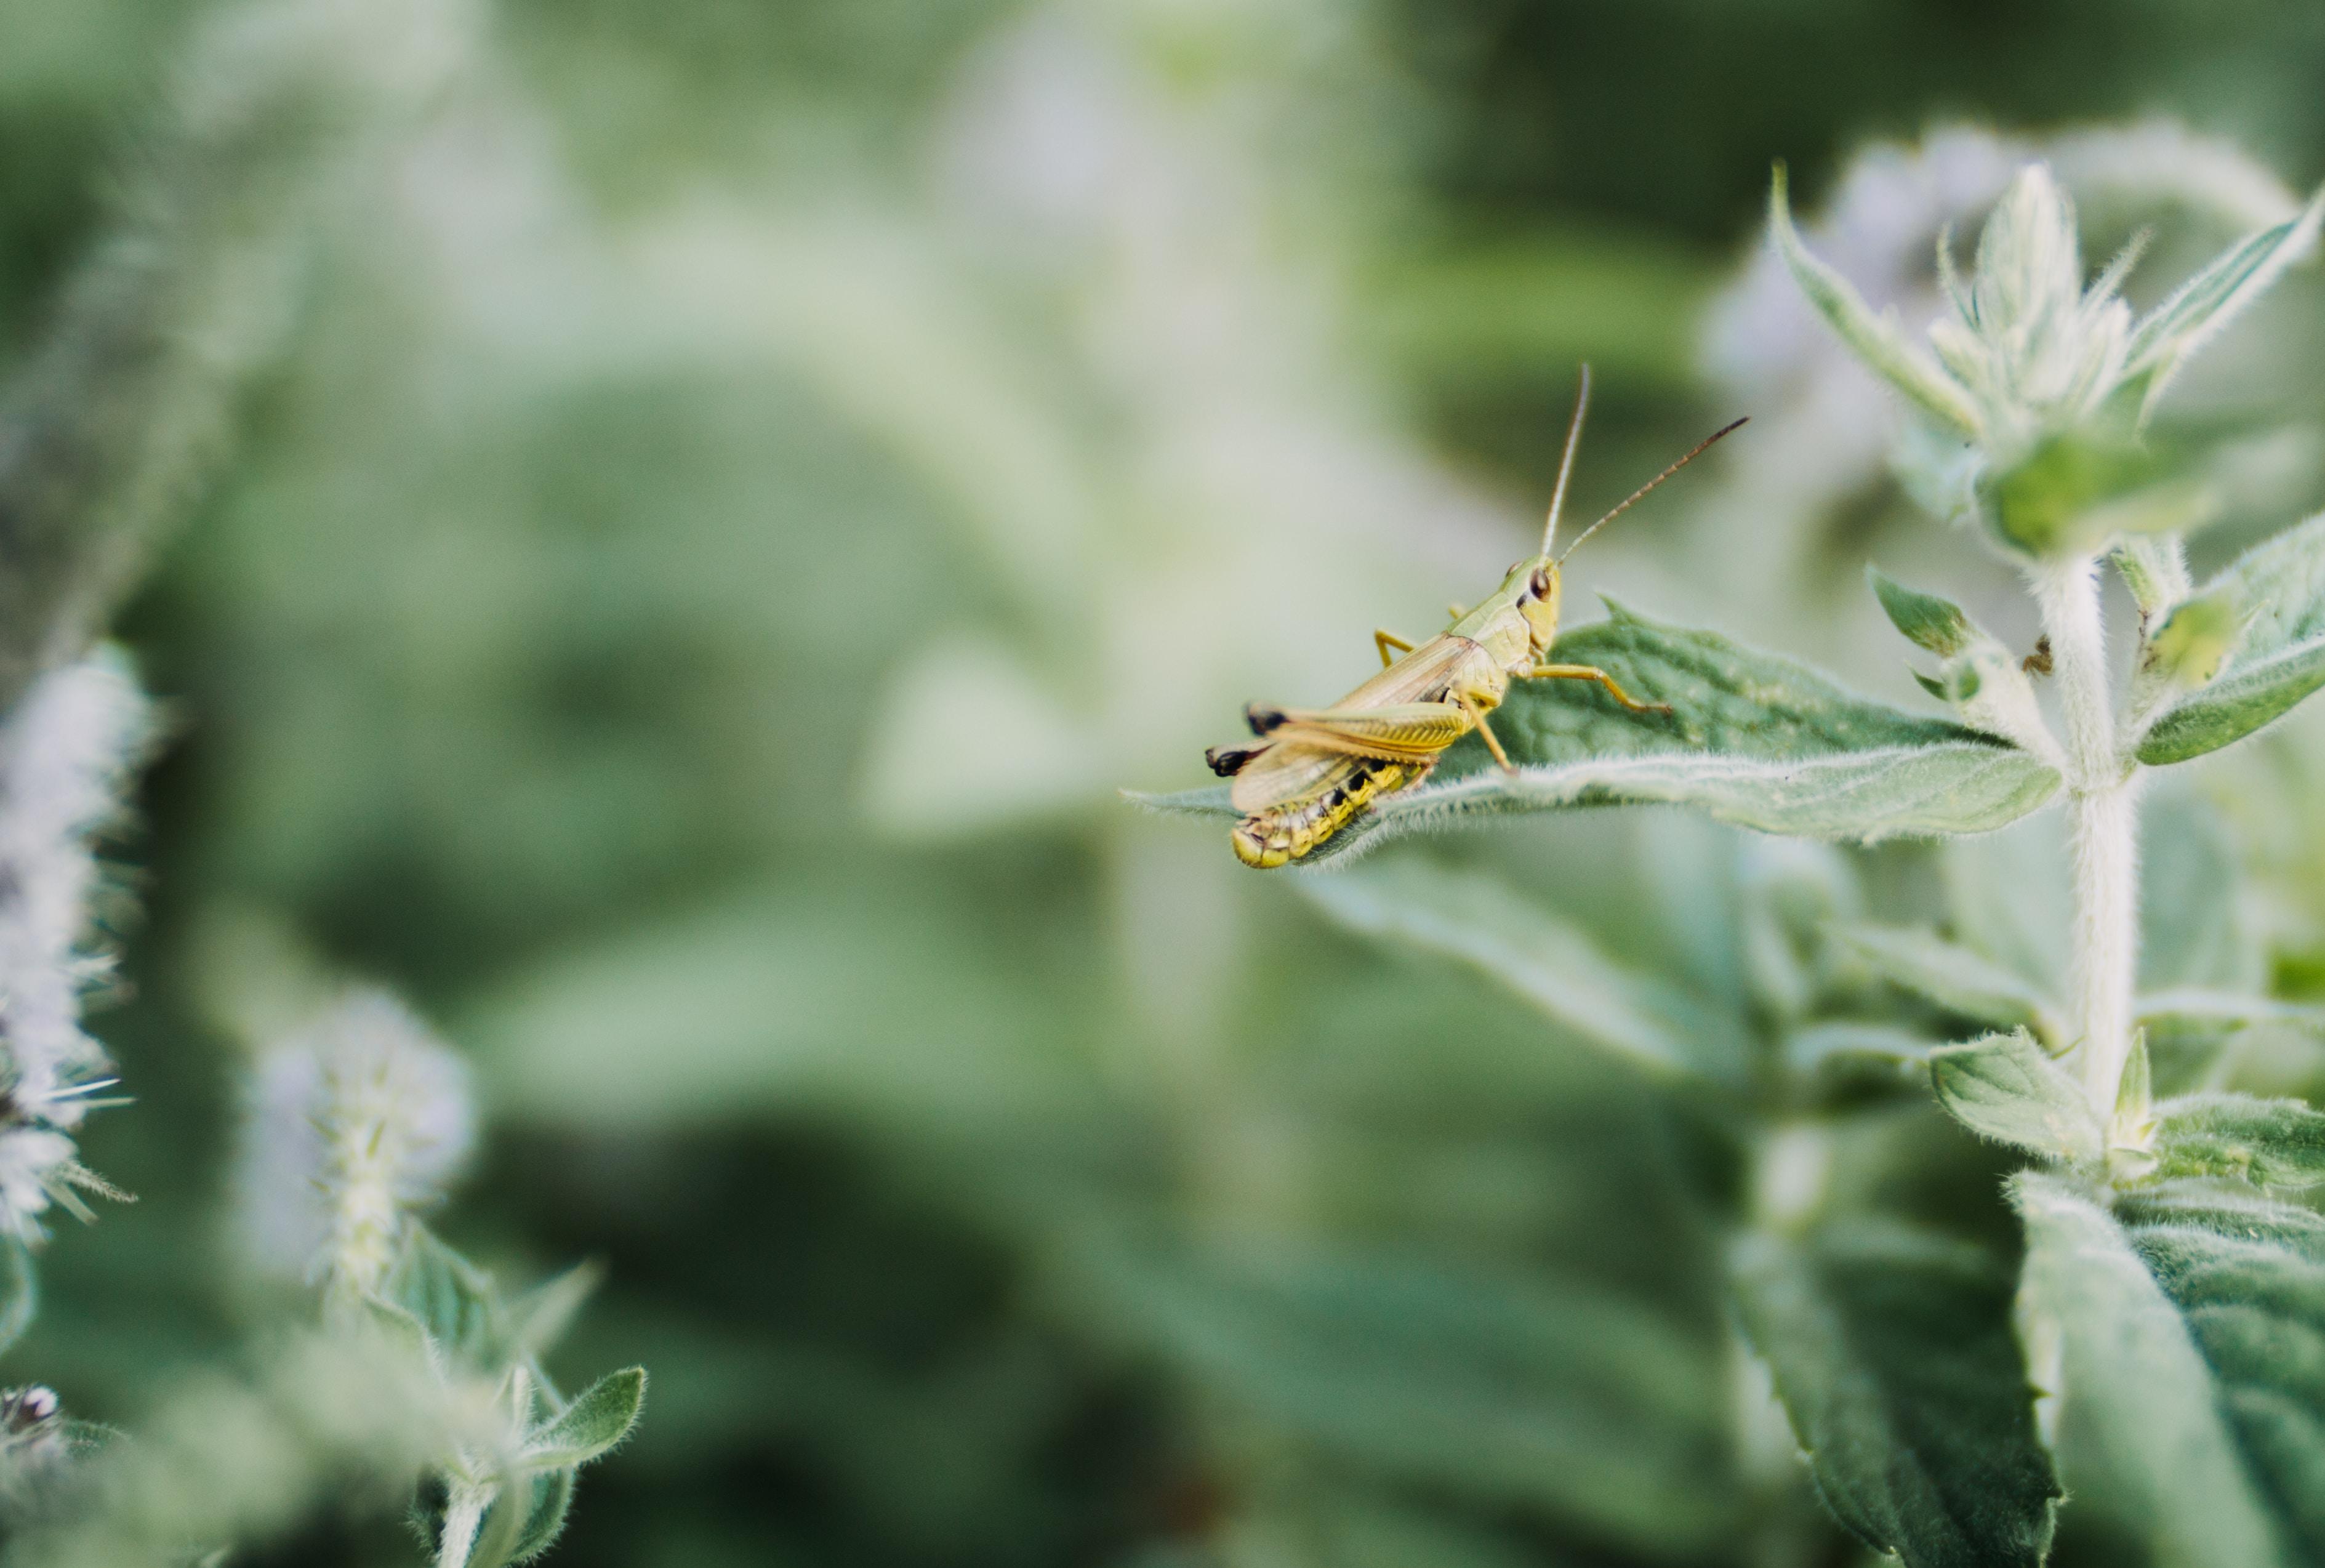 yellow grasshopper on green plant